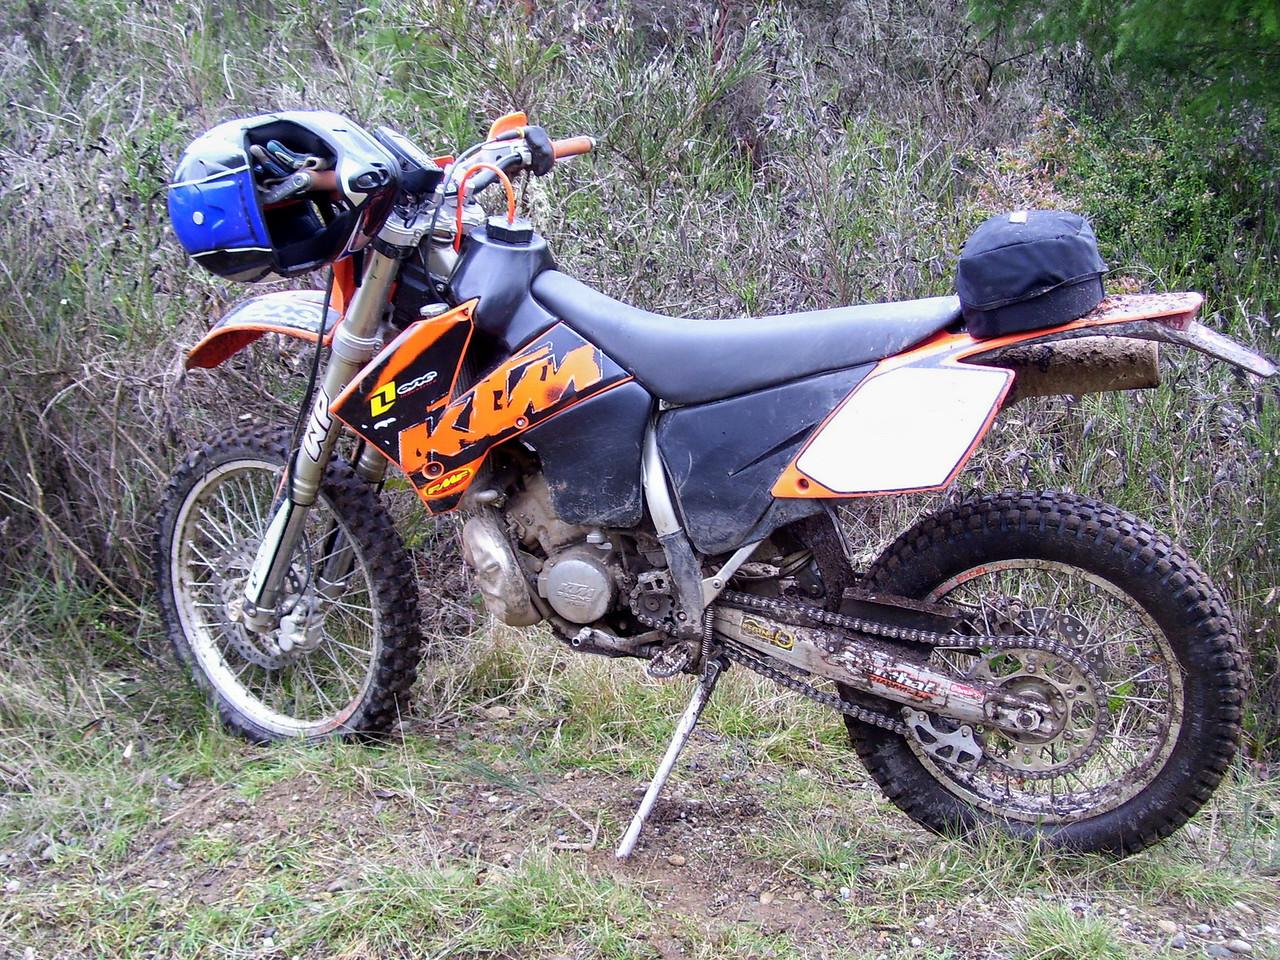 My 2005 KTM 200 EXC